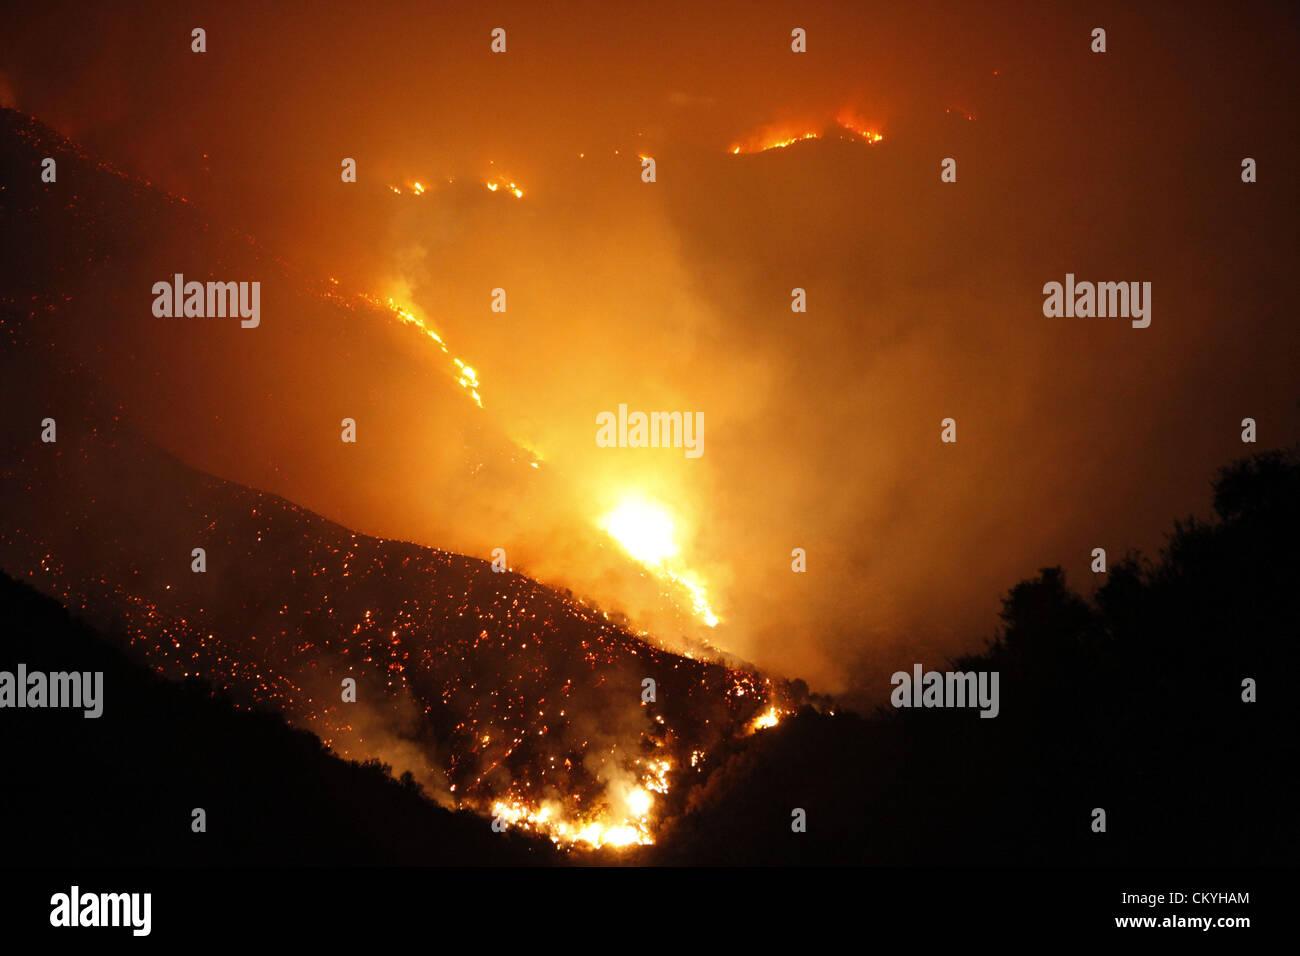 Sept. 2, 2012 - Angeles National Forest, California, U.S. - The Williams Fire burns on Sunday, September 2, 2012 - Stock Image